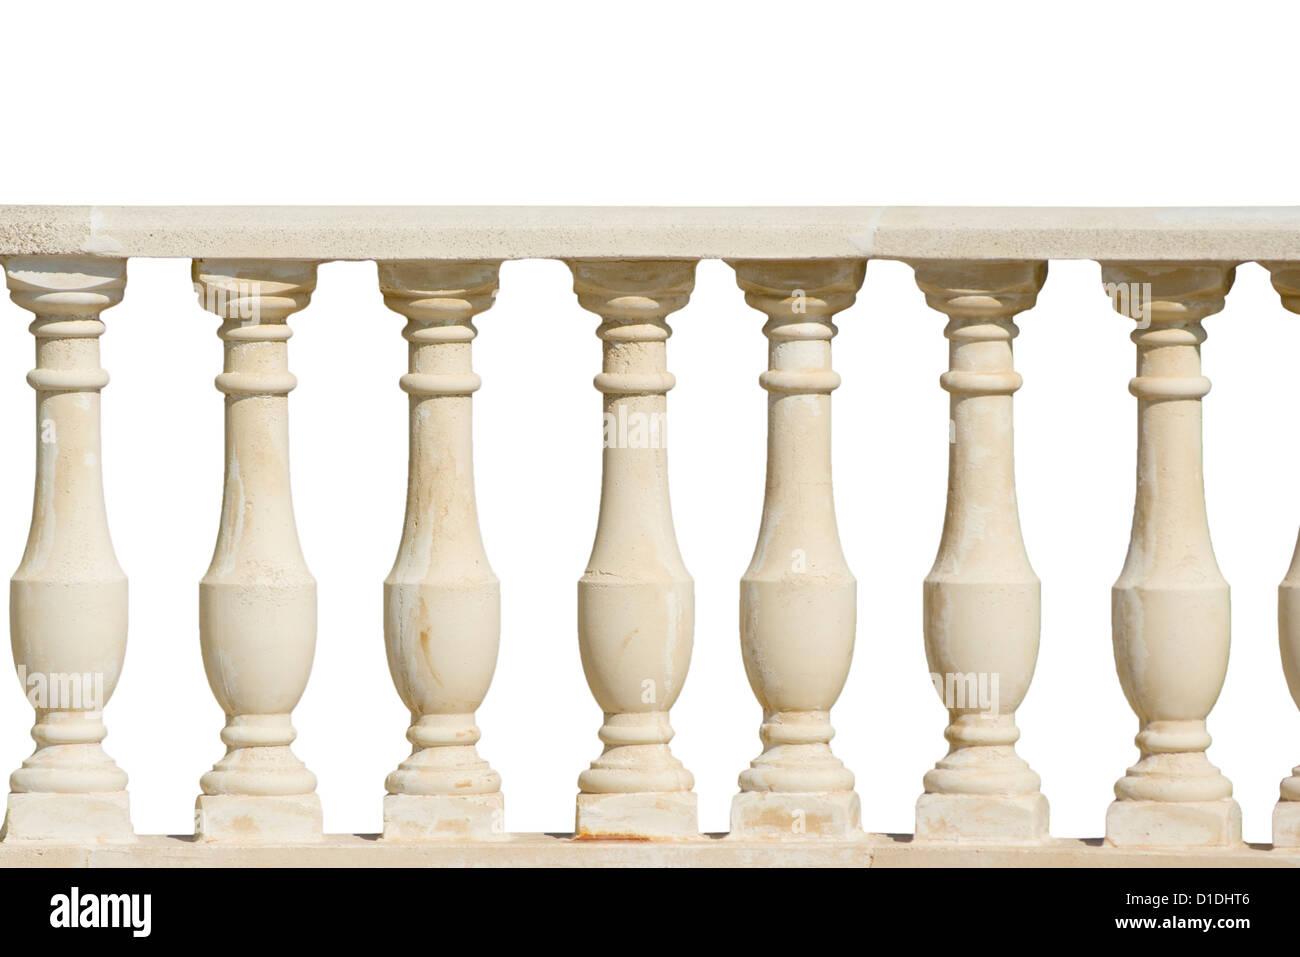 concrete balustrade stock photo royalty free image 52545142 alamy. Black Bedroom Furniture Sets. Home Design Ideas